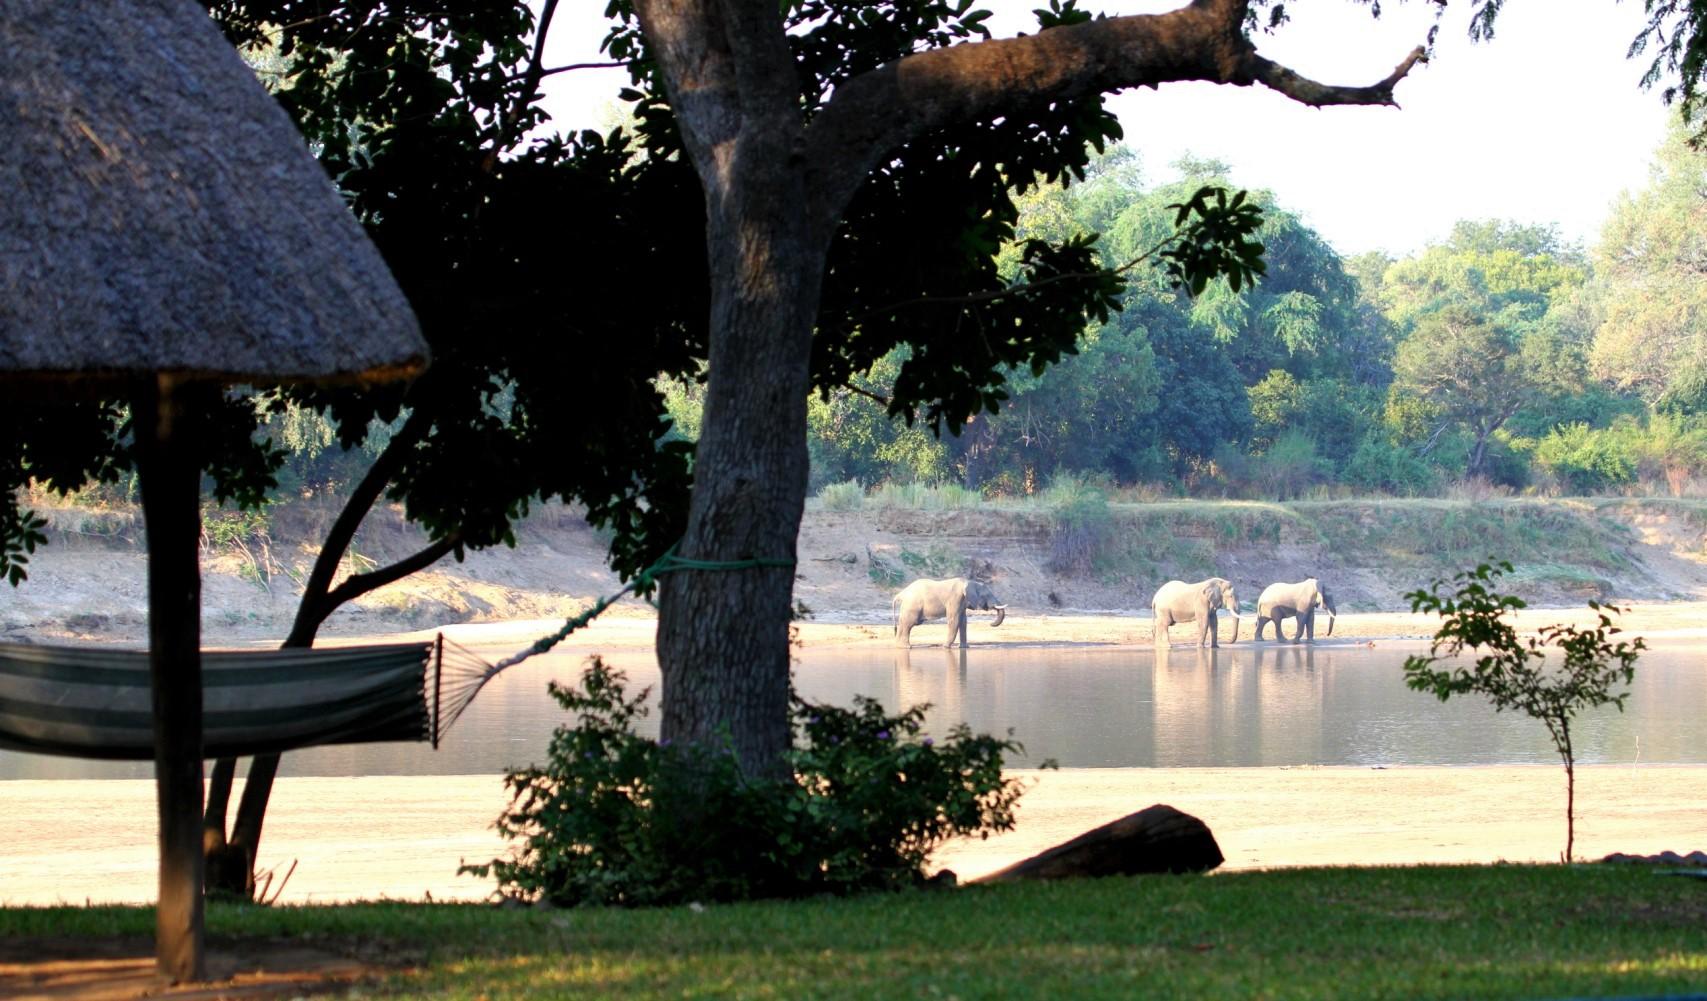 Camping Luangwa River